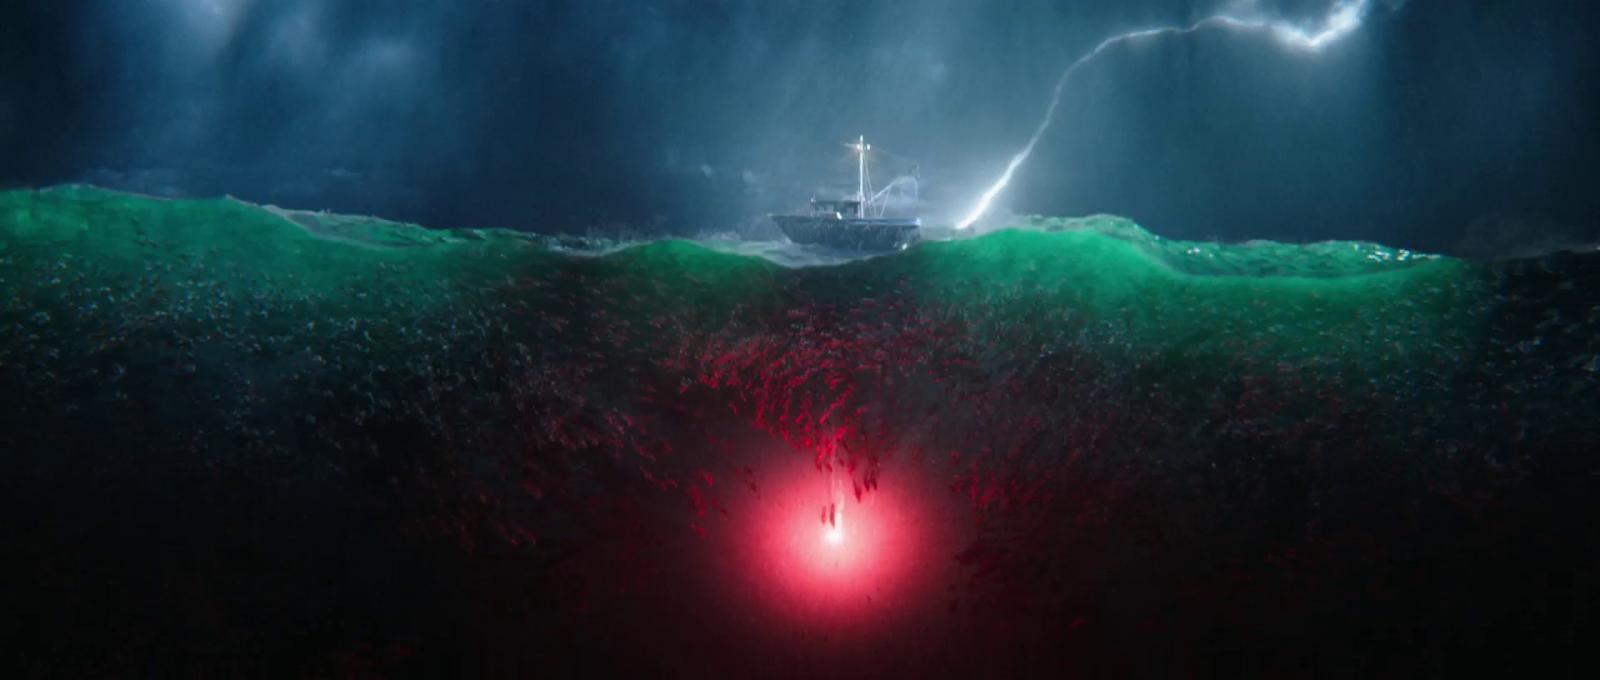 src: https://cinematiccorner.blogspot.com/2018/07/aquaman-trailer-breakdown.html